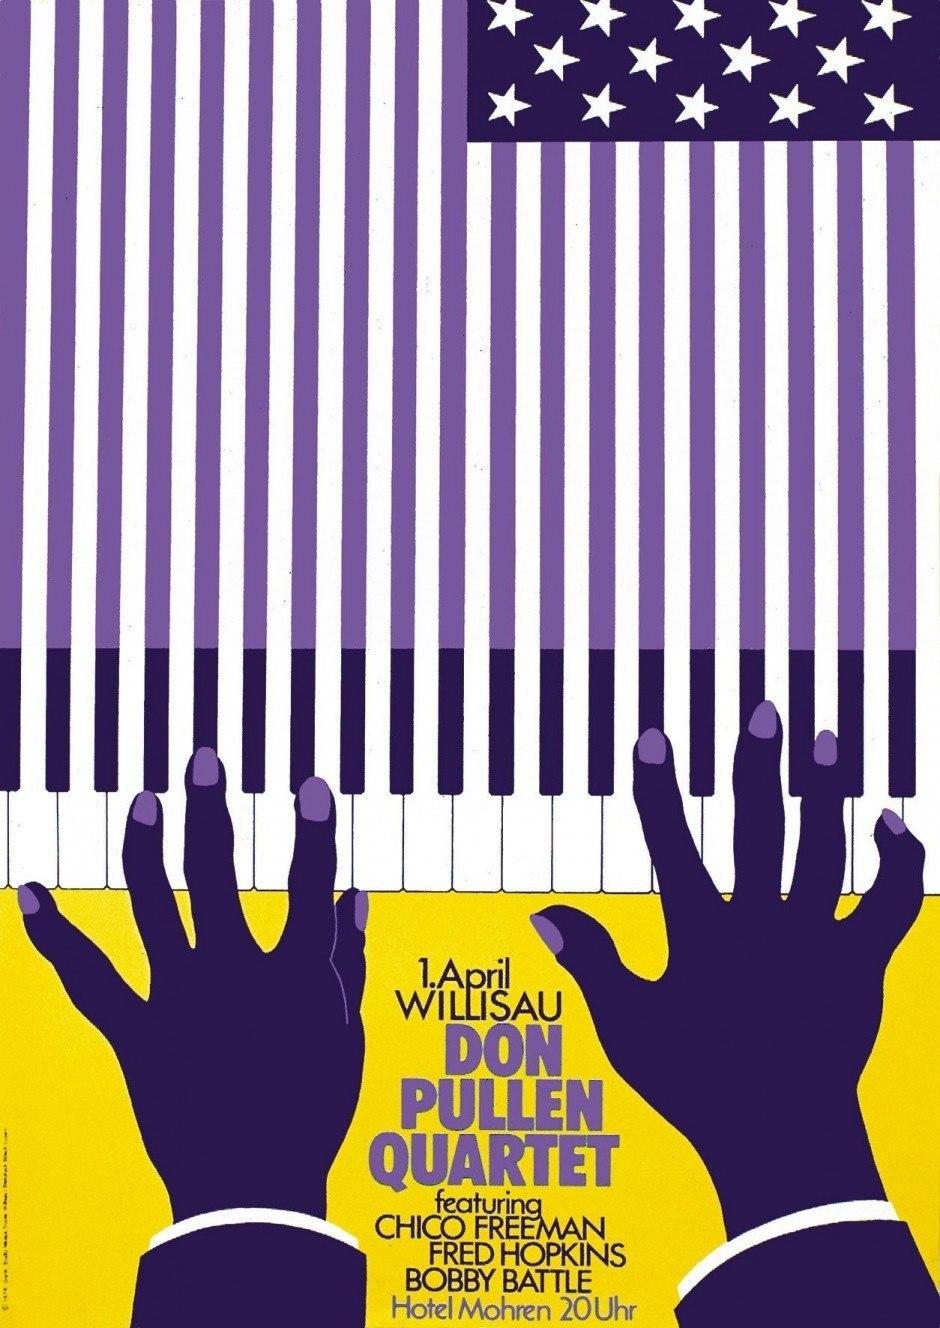 Niklaus Troxler – Plakat Don Pullen Quartet, 1978